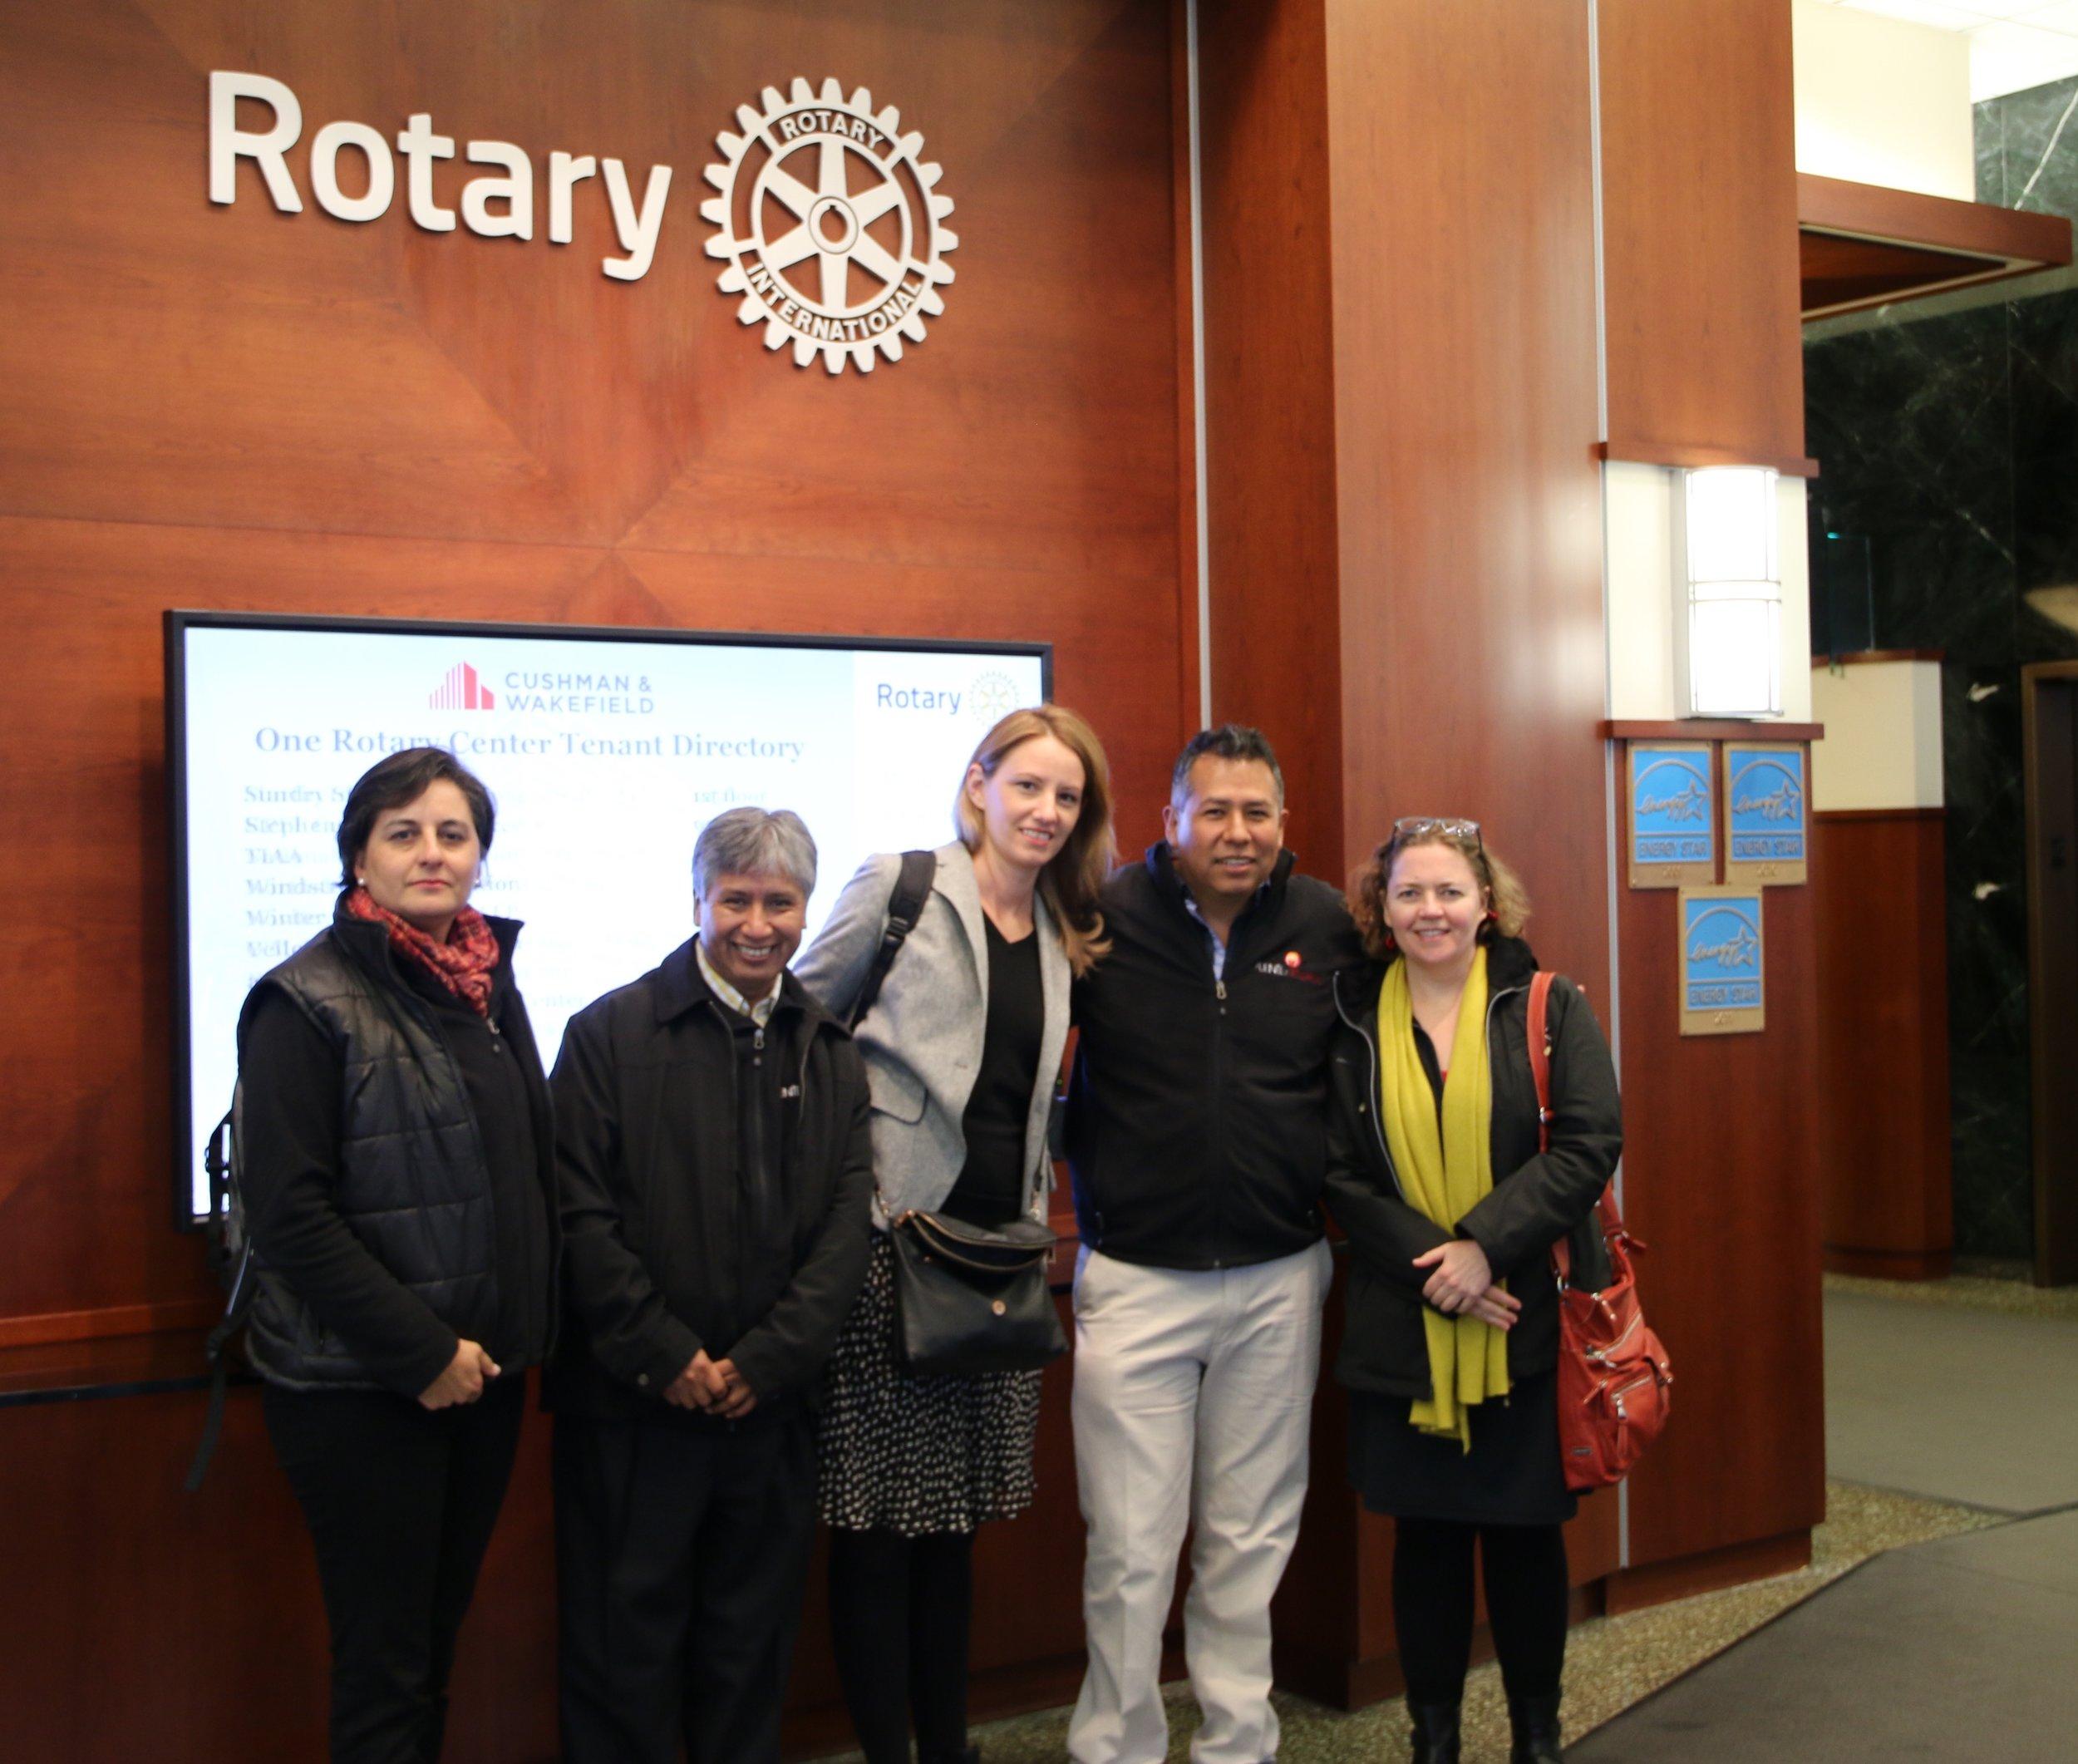 At Rotary International headquarters in Evanston